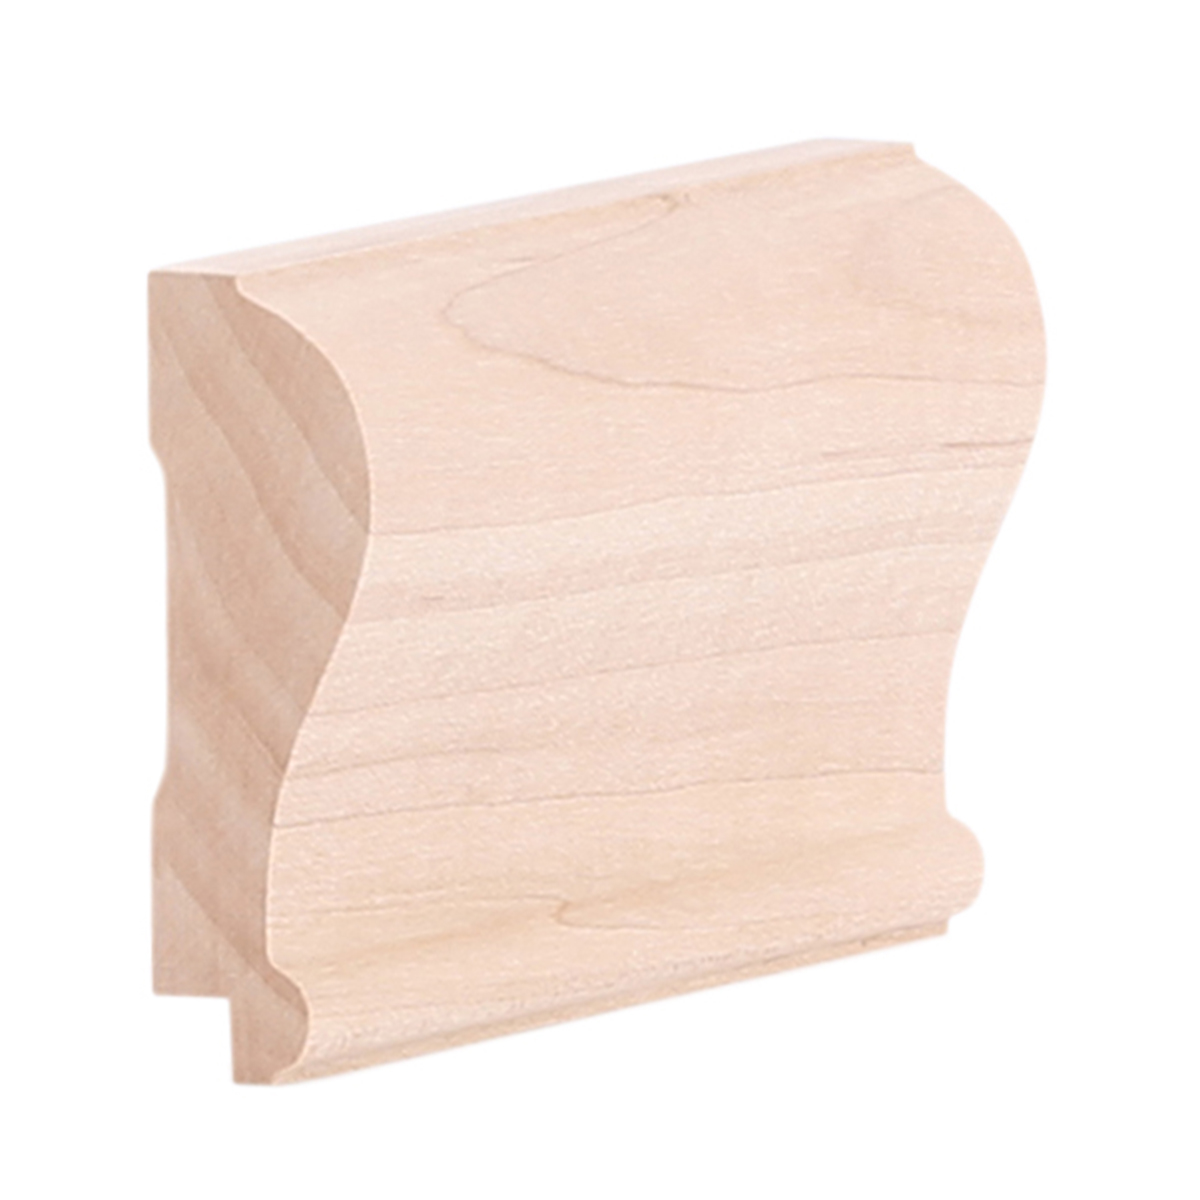 modern chair rail orange leather 3 4 x 2 8 hard maple w rabbet b400r